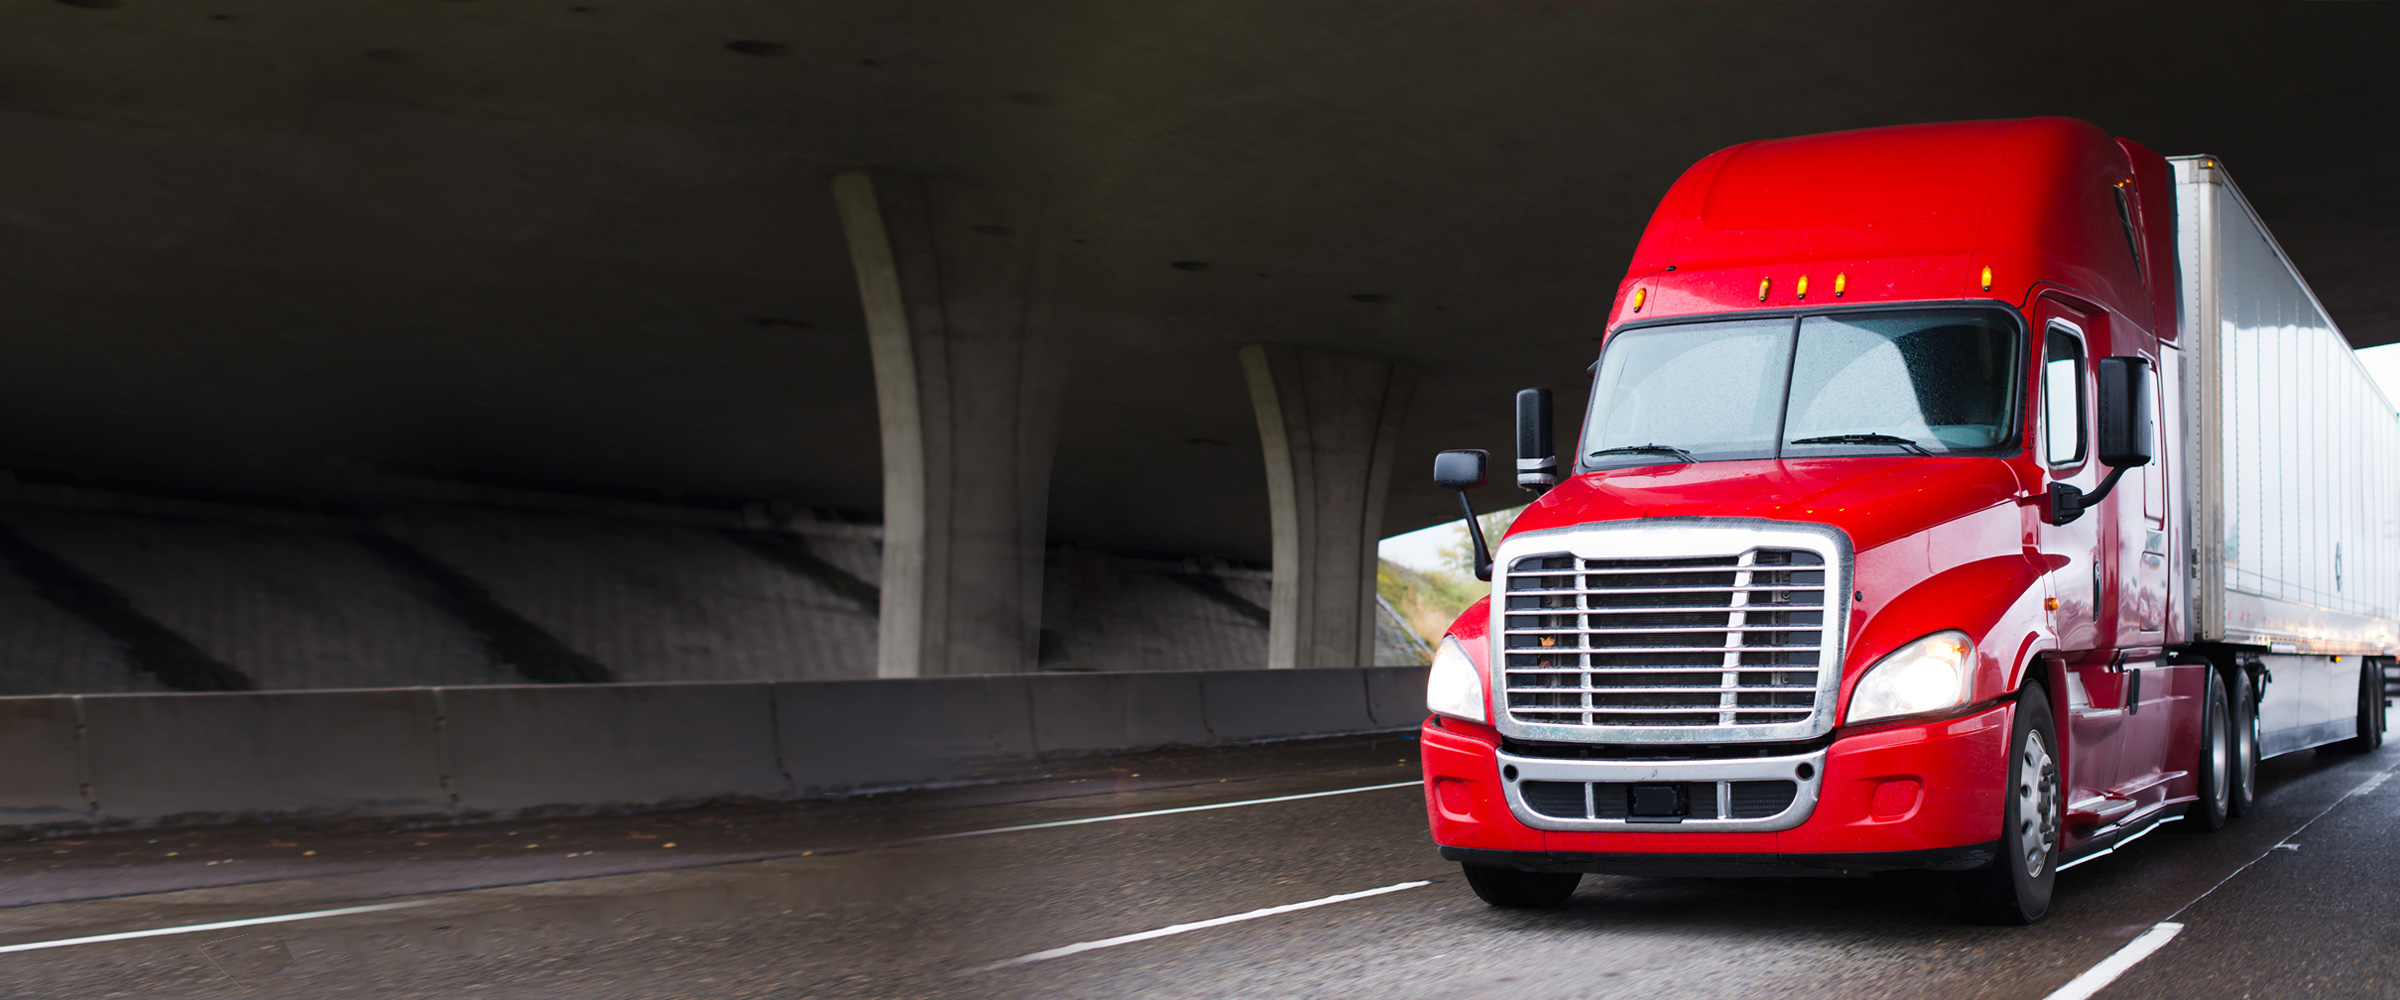 trucking-ind-f_2400x1000